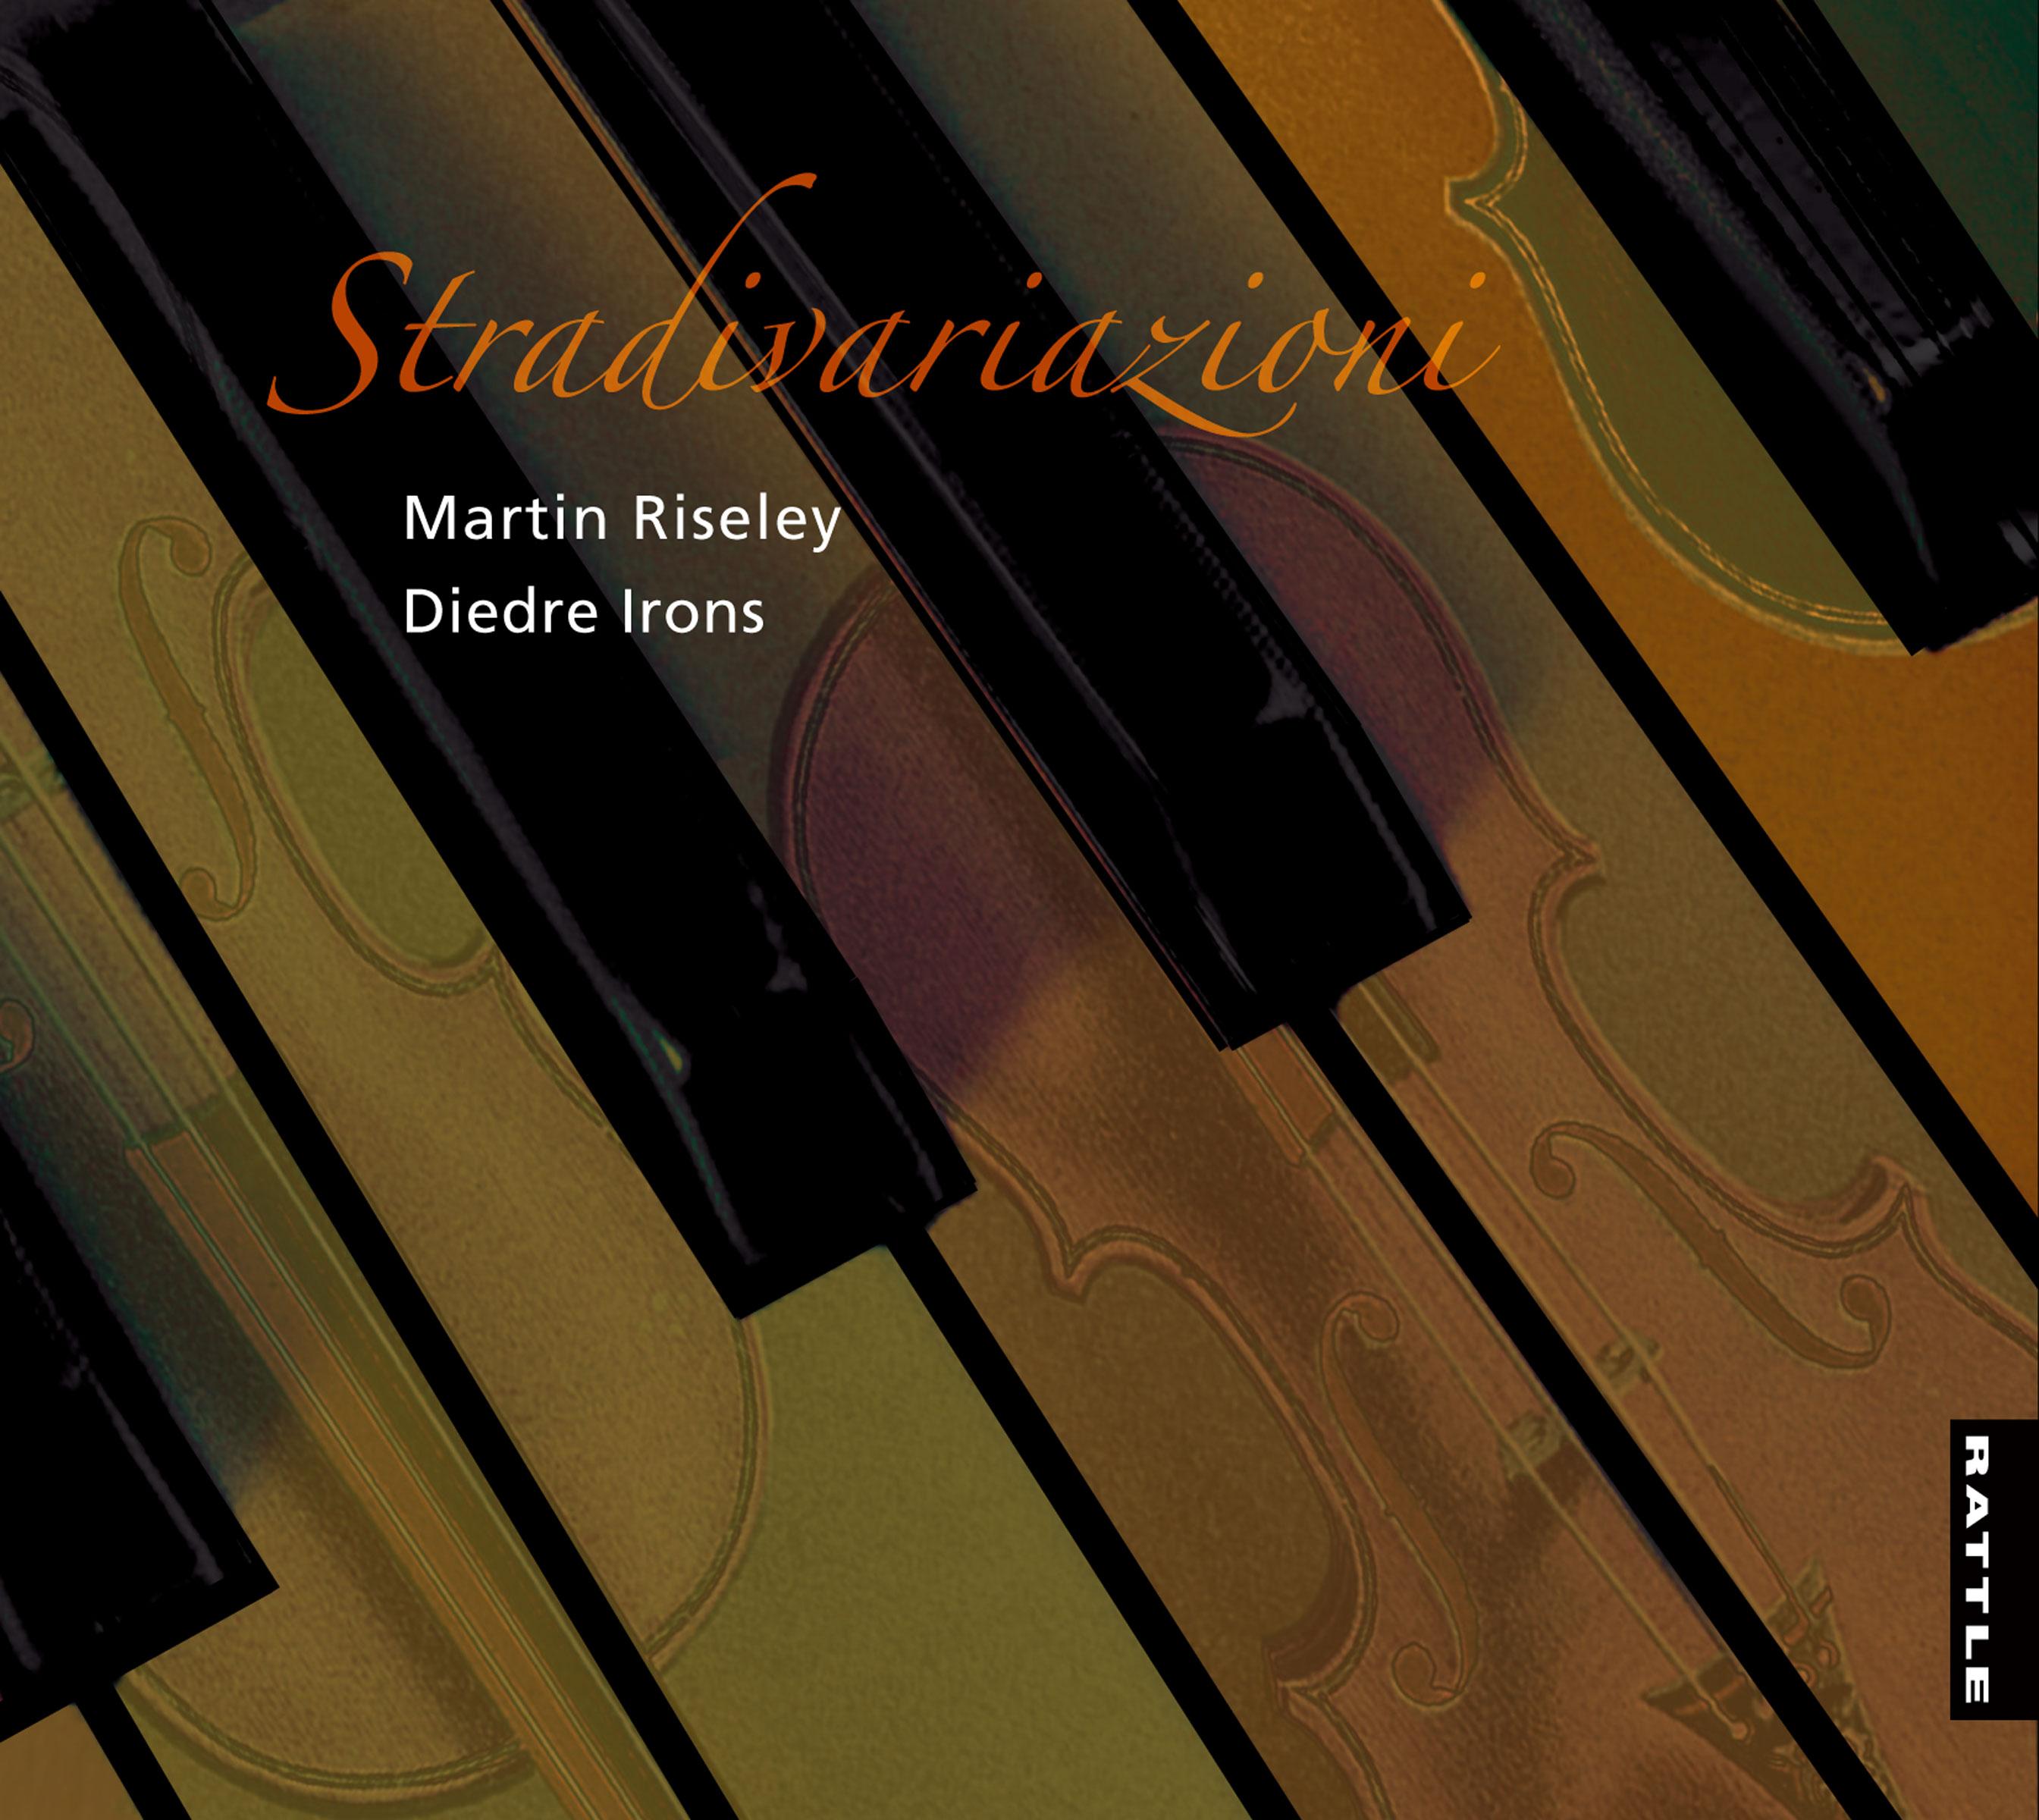 Martin Riseley & Diedre Irons | Stradivariazioni - downloadable MP3 ALBUM